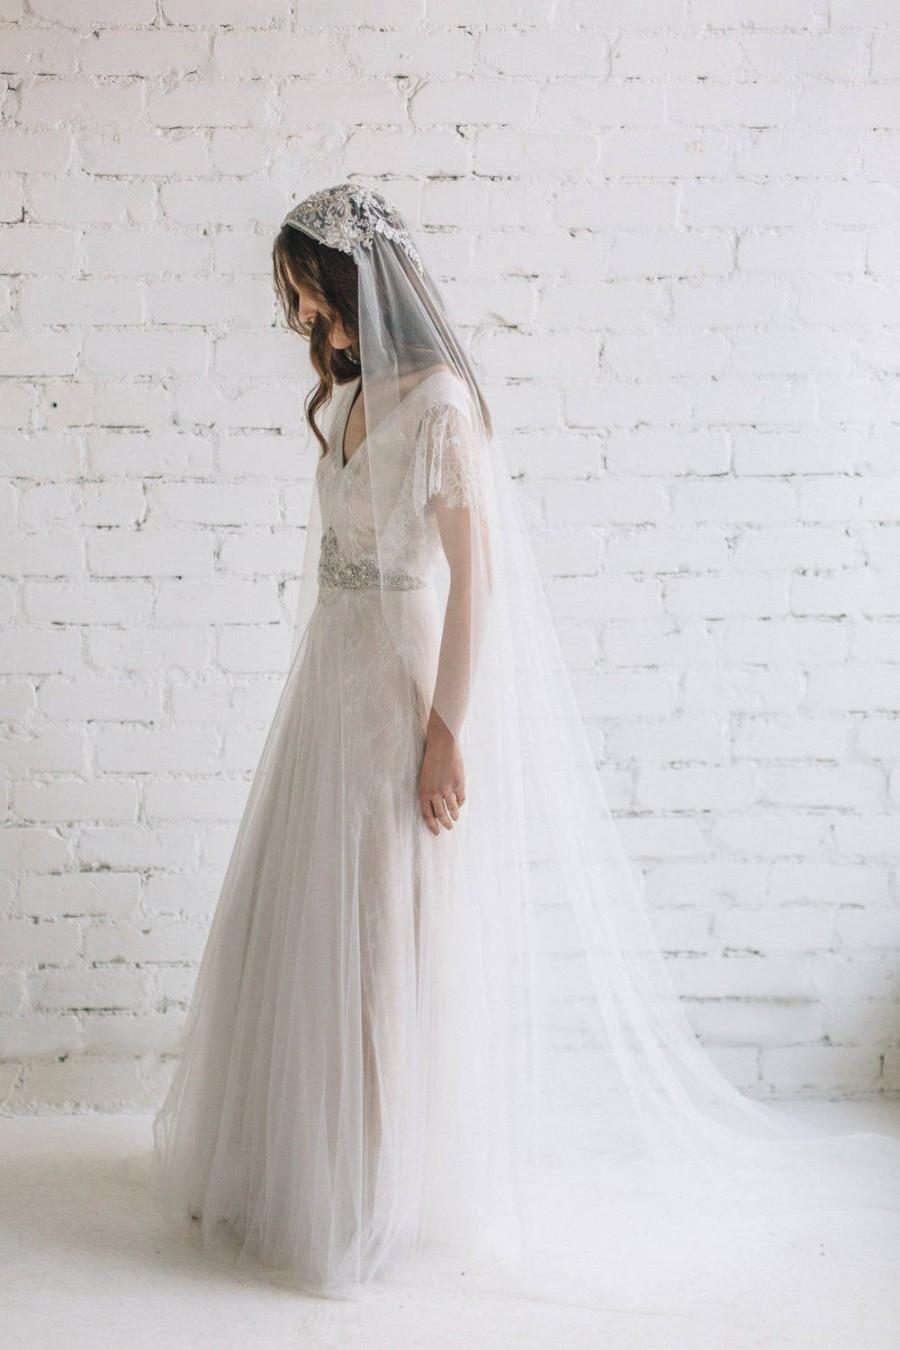 Wedding - Juliet Cap Bridal Veil , Boho Wedding Veil , Veil with Crystals , White Opal Swarovski Veil - AMELIA